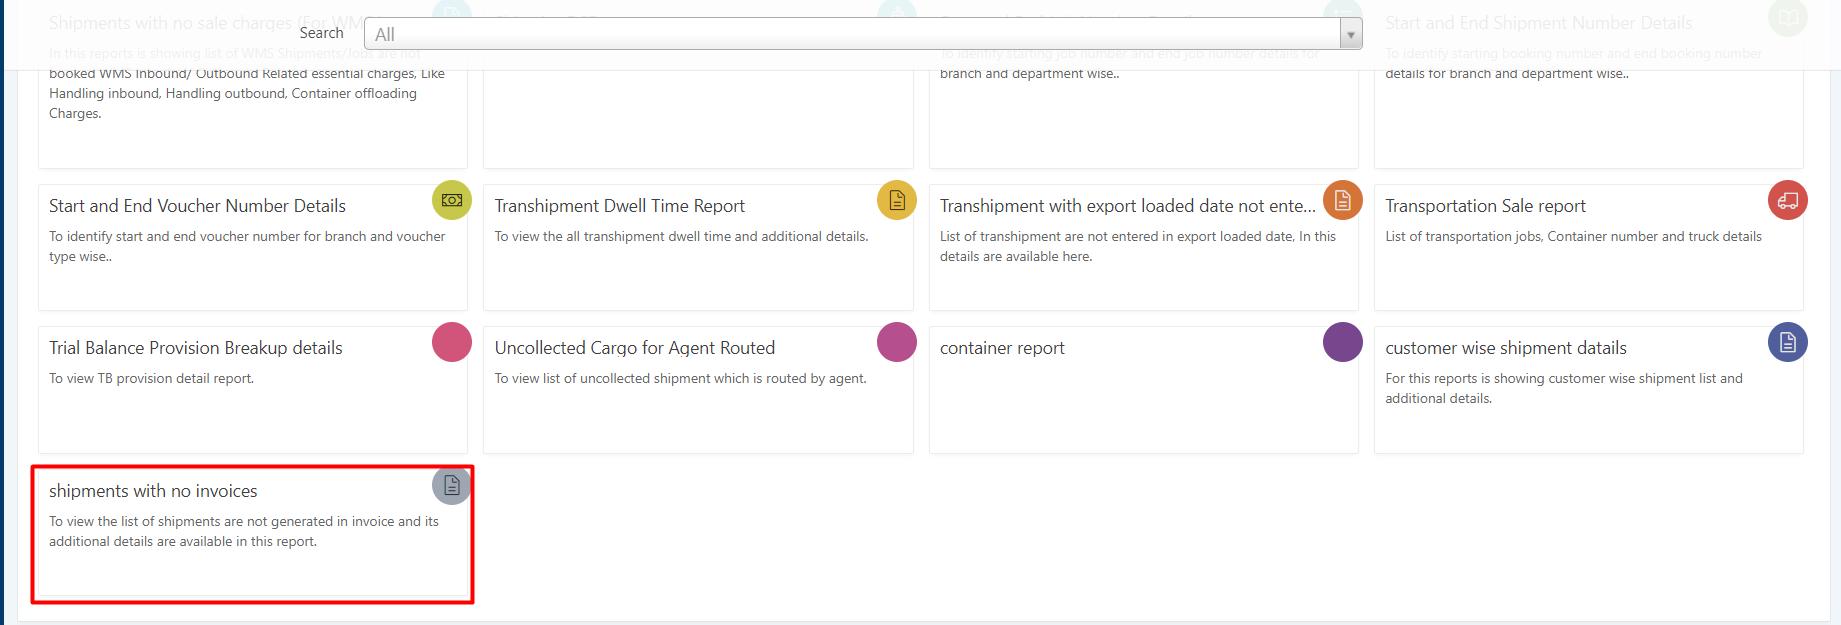 invoices report